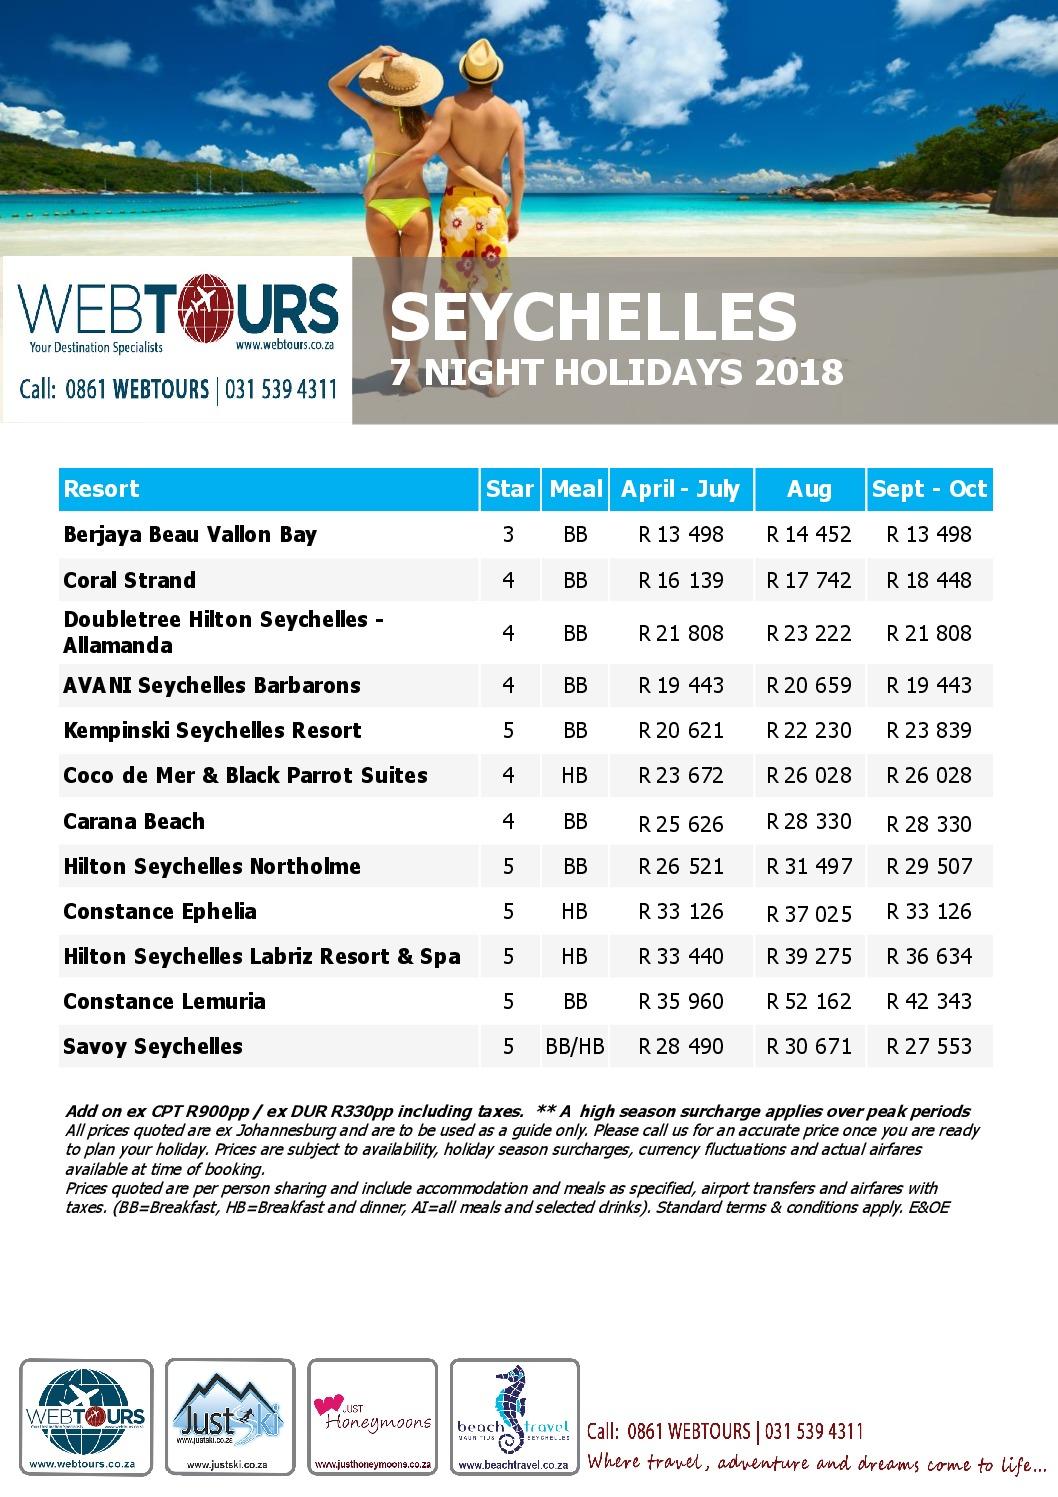 7 Nights Seychelles, Valid until Oct '18